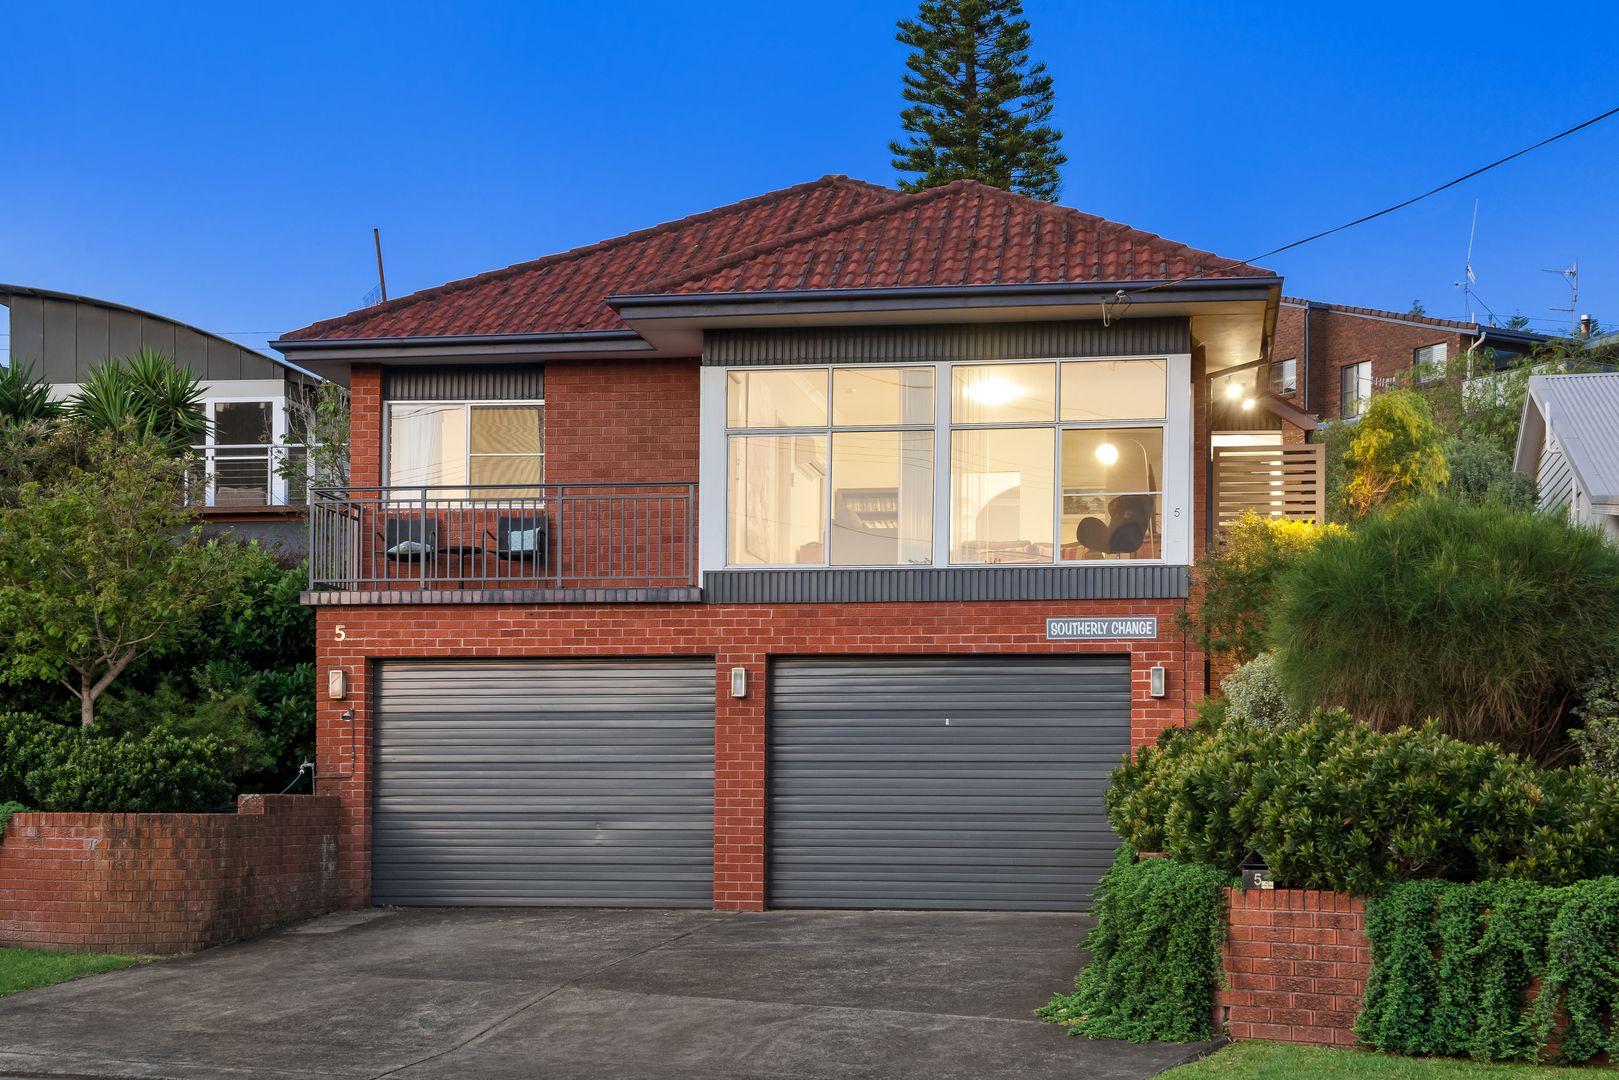 5 Riverleigh  Avenue, Gerroa NSW 2534, Image 0